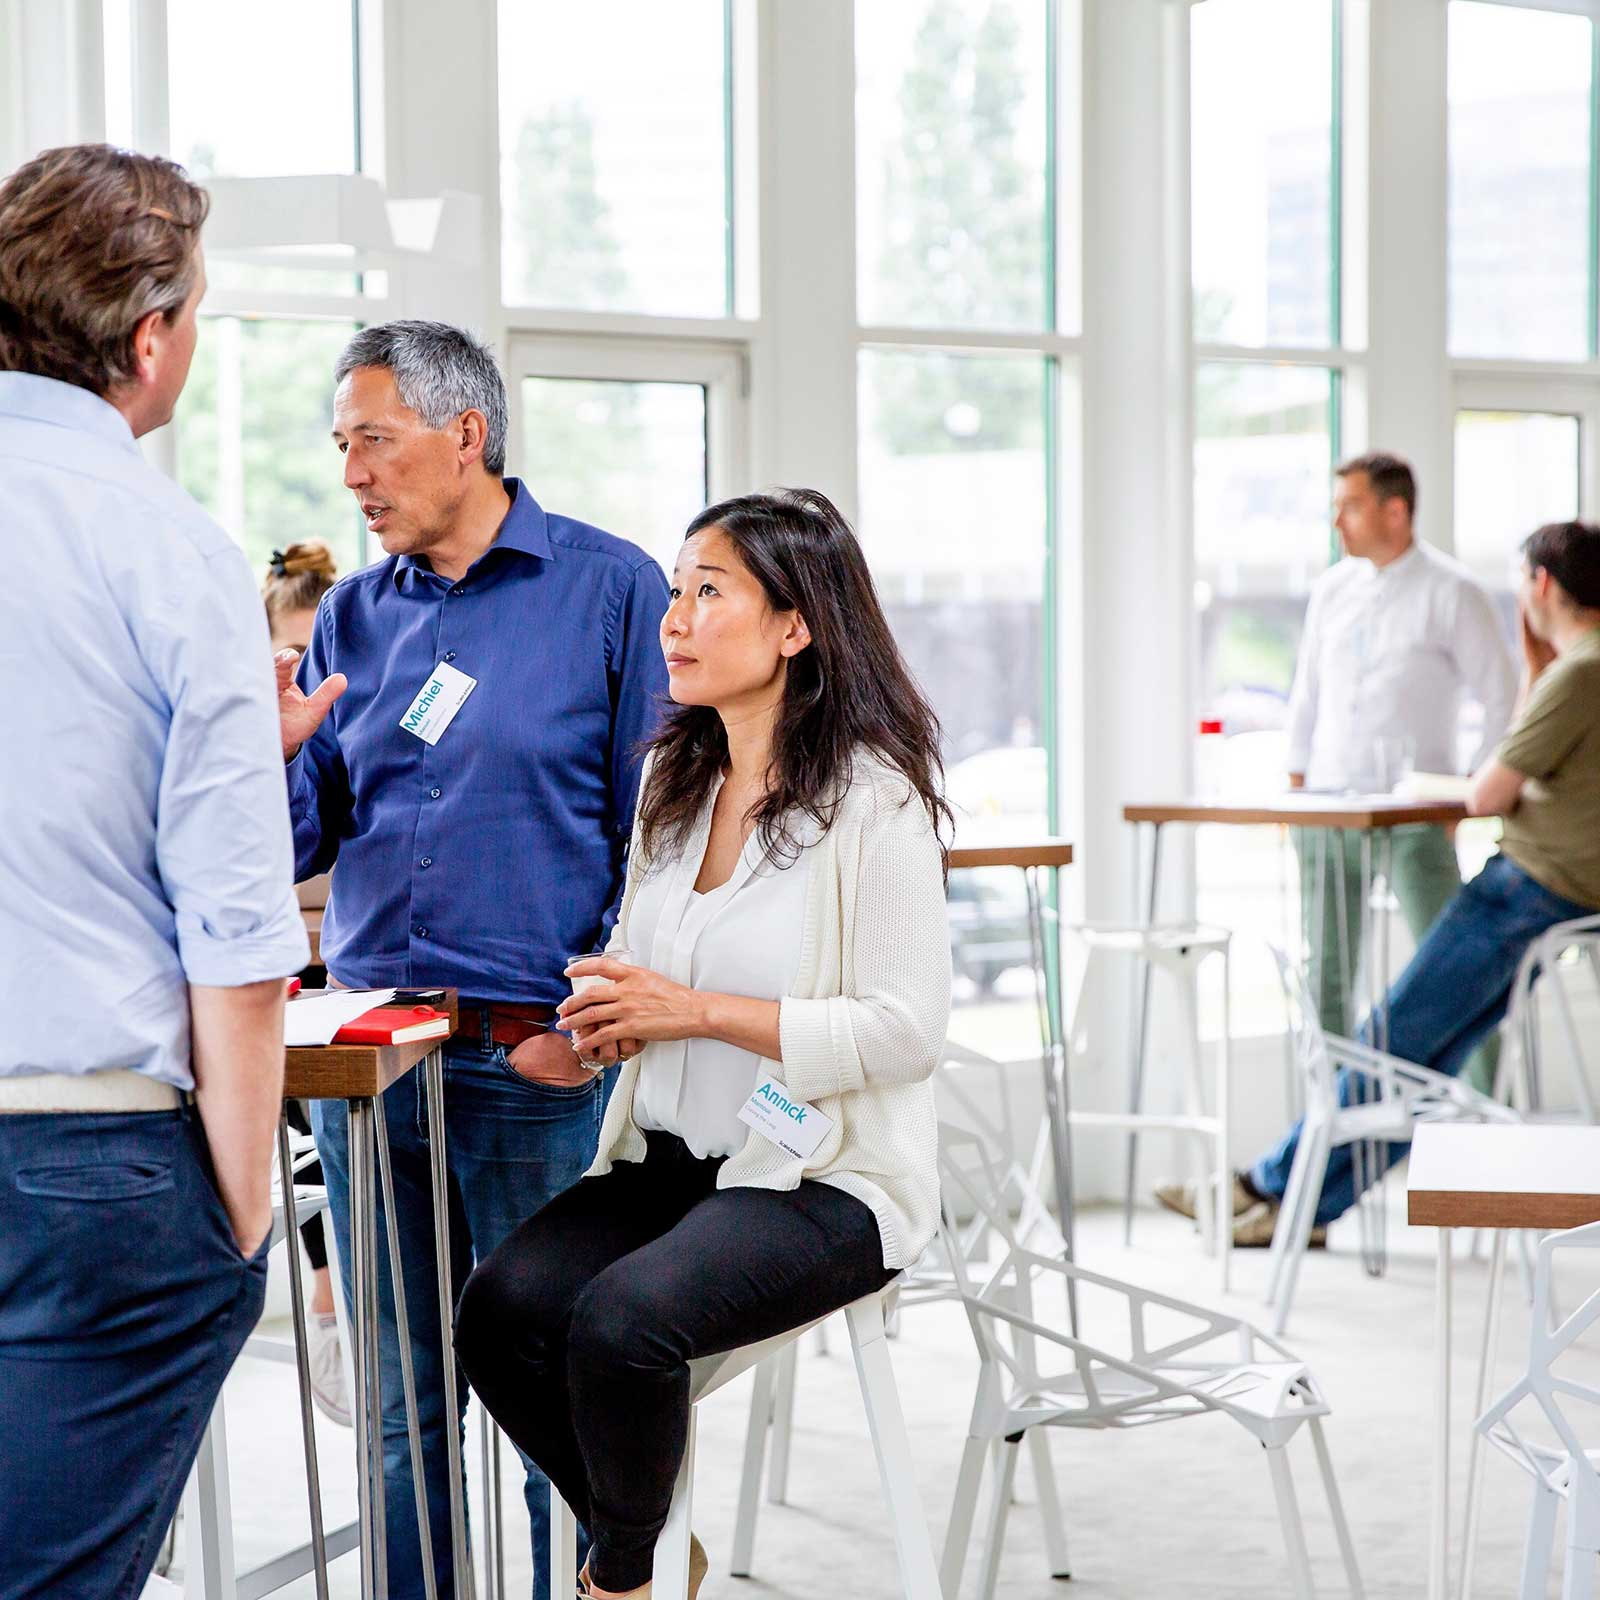 Scaleup founders meet in Amsterdam